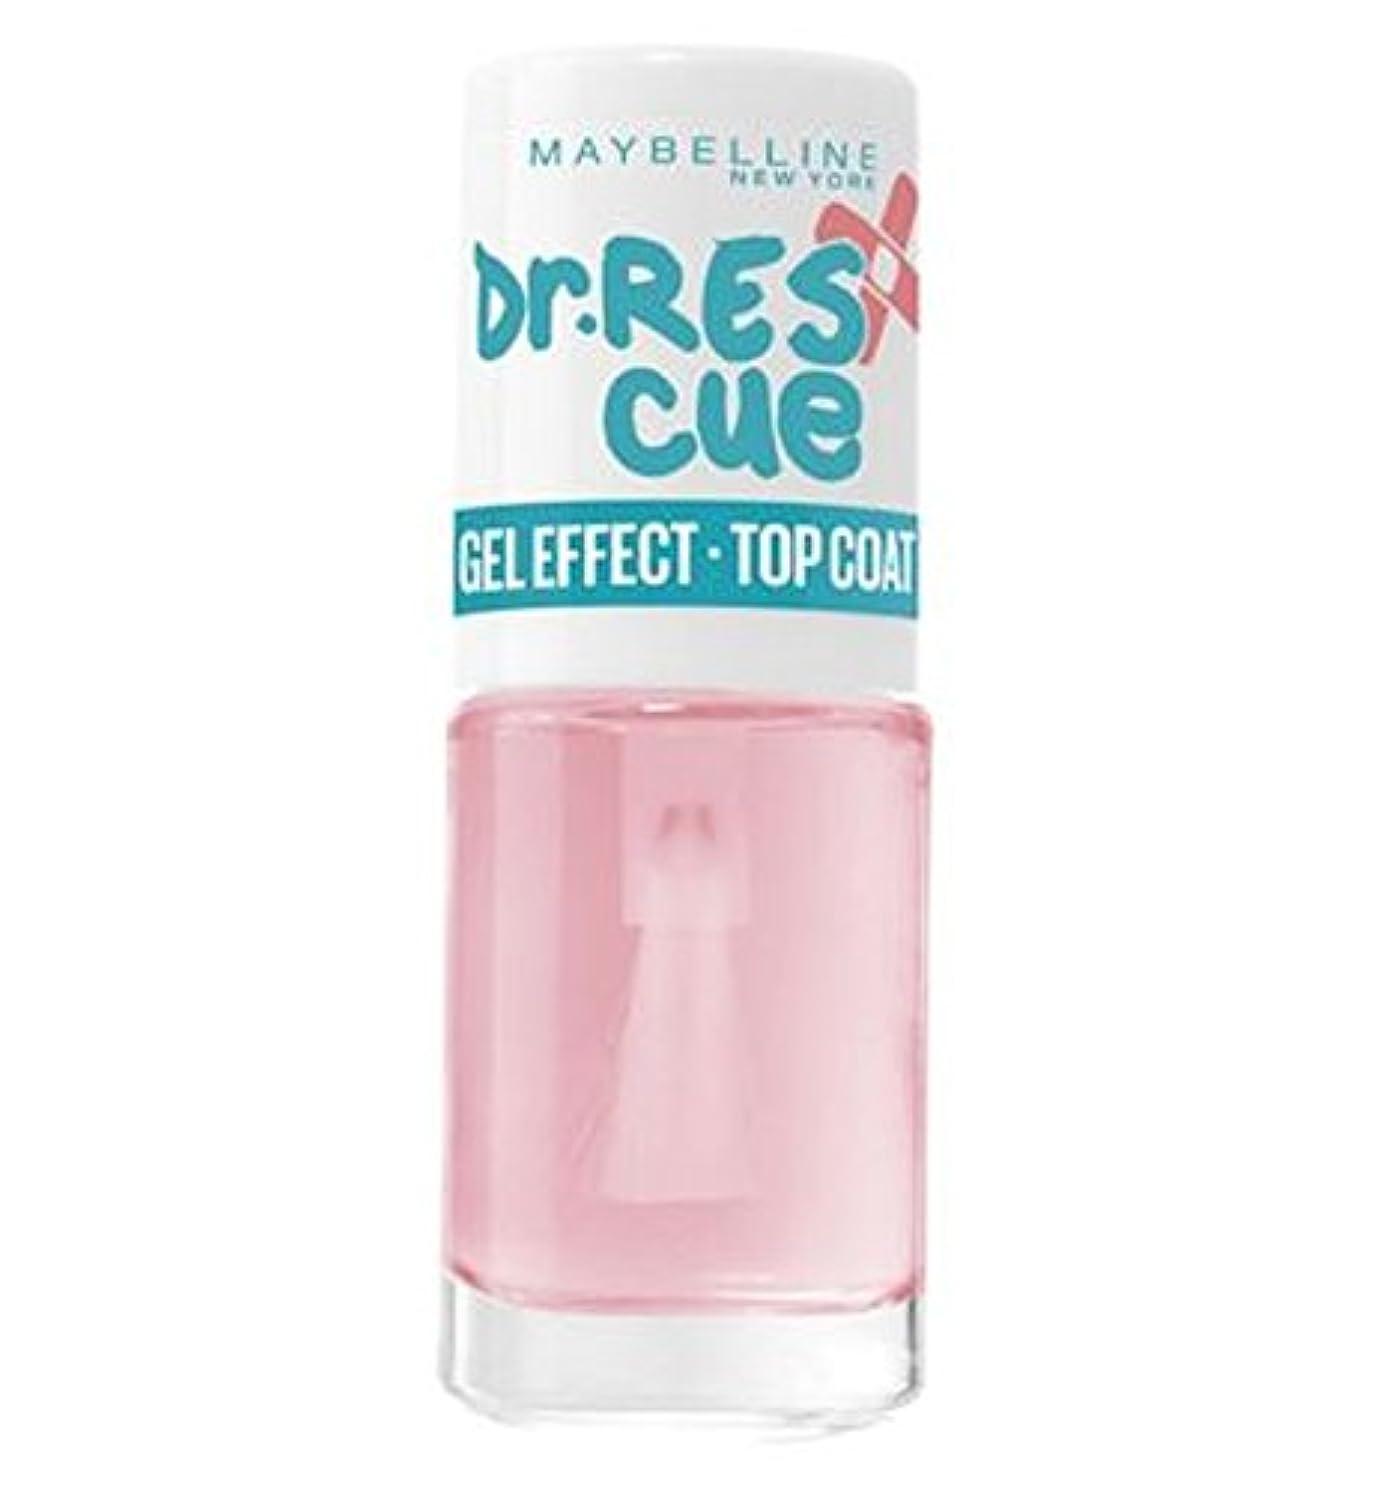 Maybelline Dr Rescue Nail Care Gel Top Coat 7ml - メイベリンのDr救助ネイルケアジェルトップコート7ミリリットル (Maybelline) [並行輸入品]